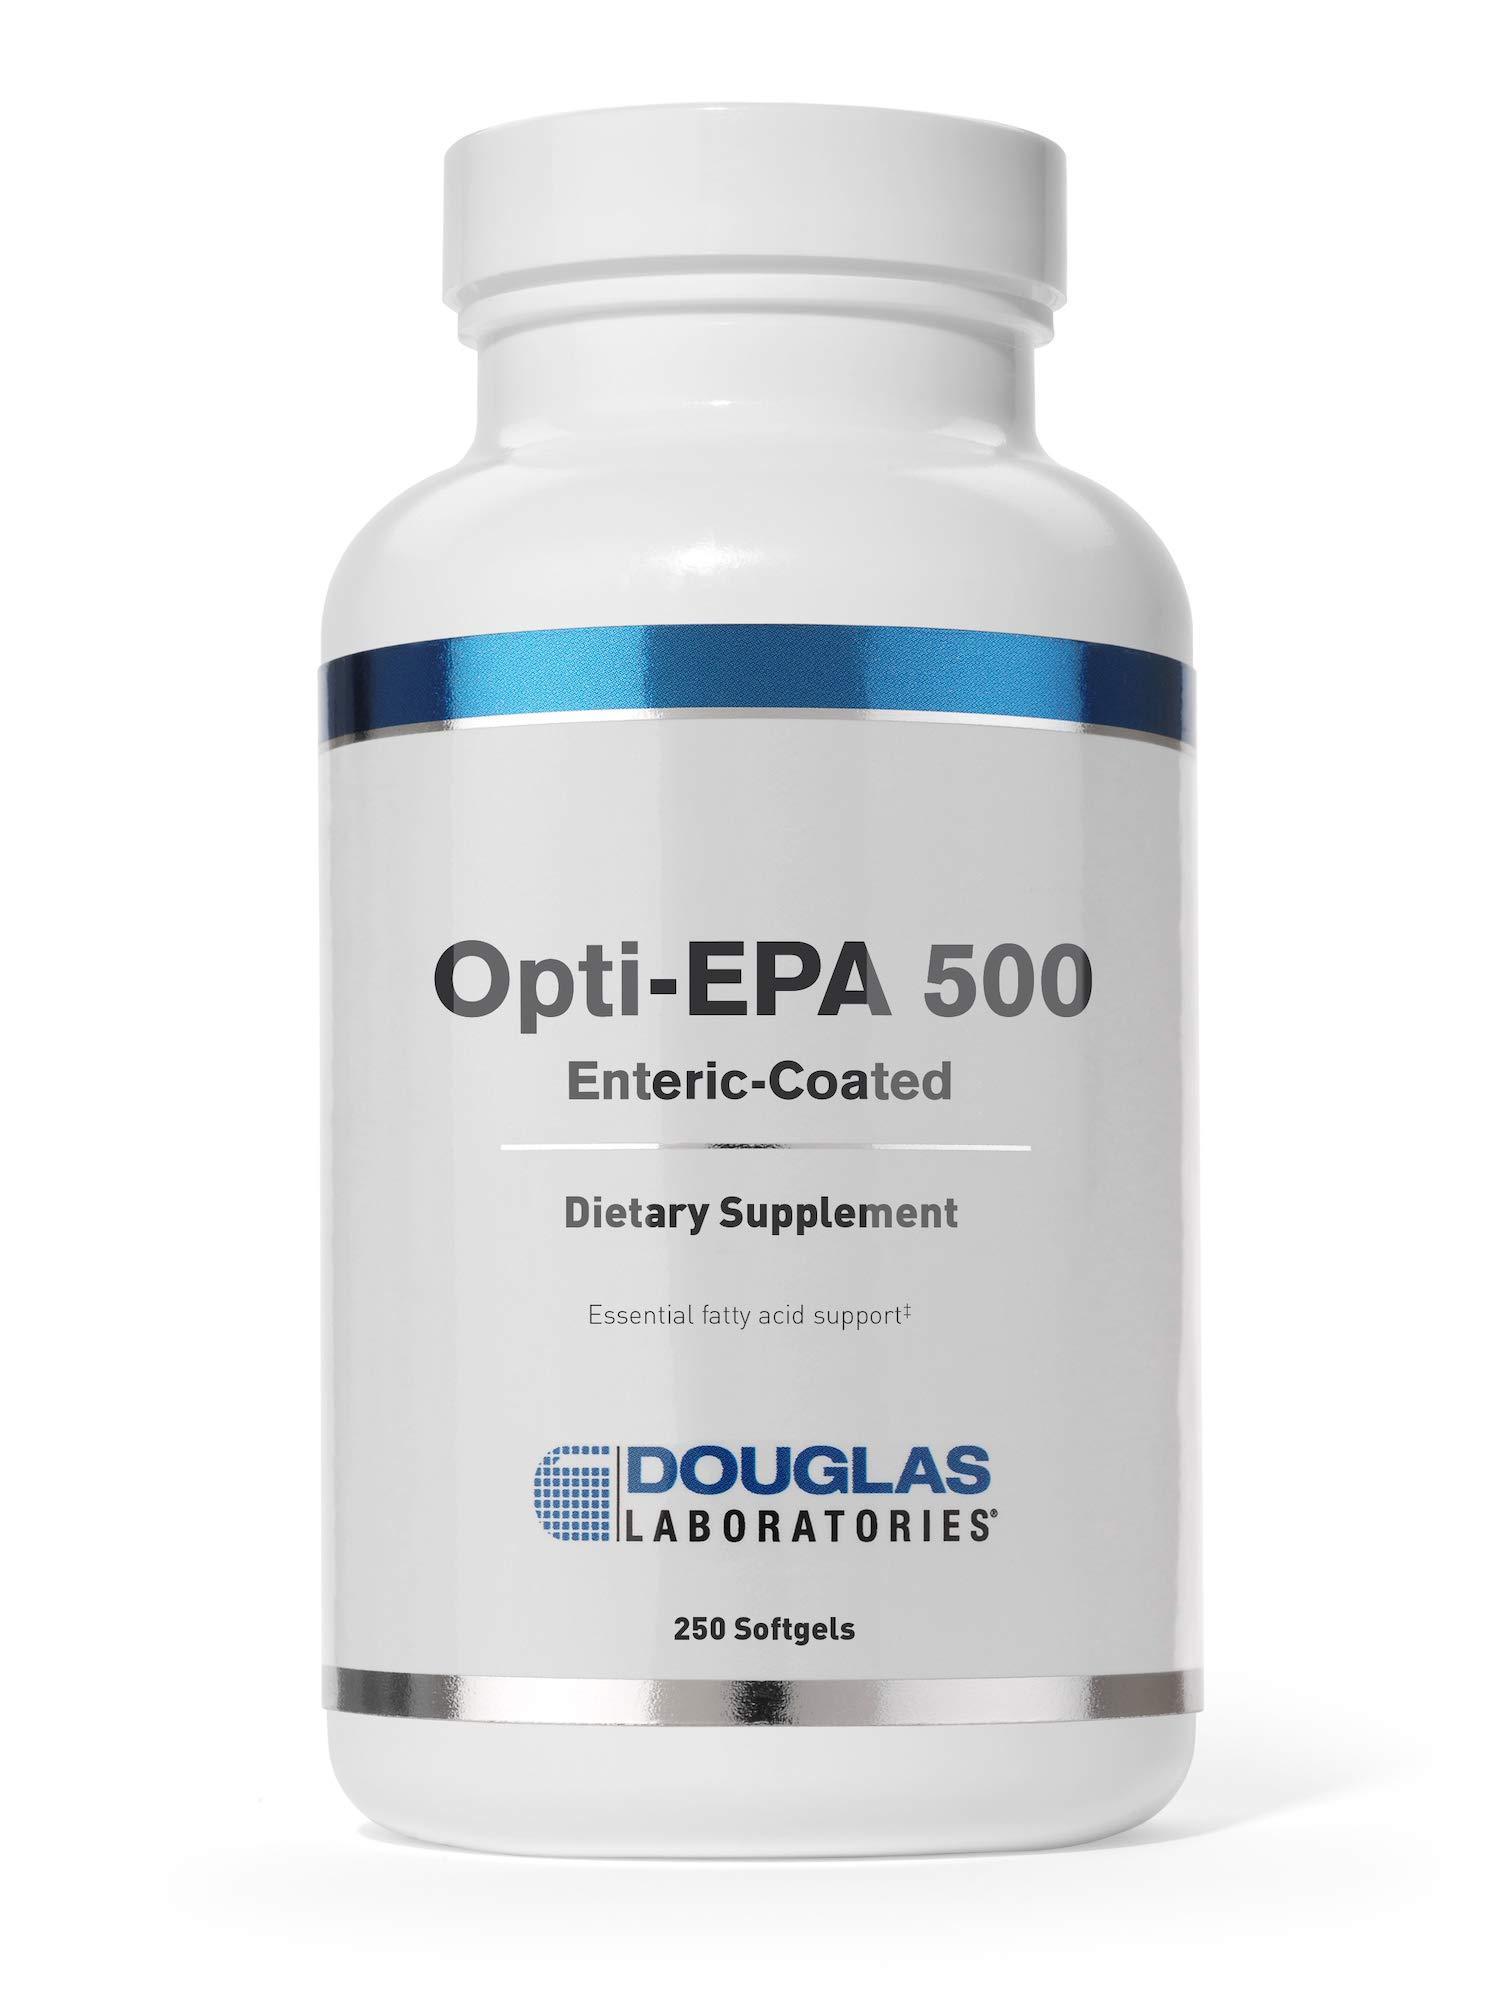 Douglas Laboratories - Opti-EPA 500 - Supports Brain, Eyes, Pregnancy and Cardiovascular Health* - 250 Softgels